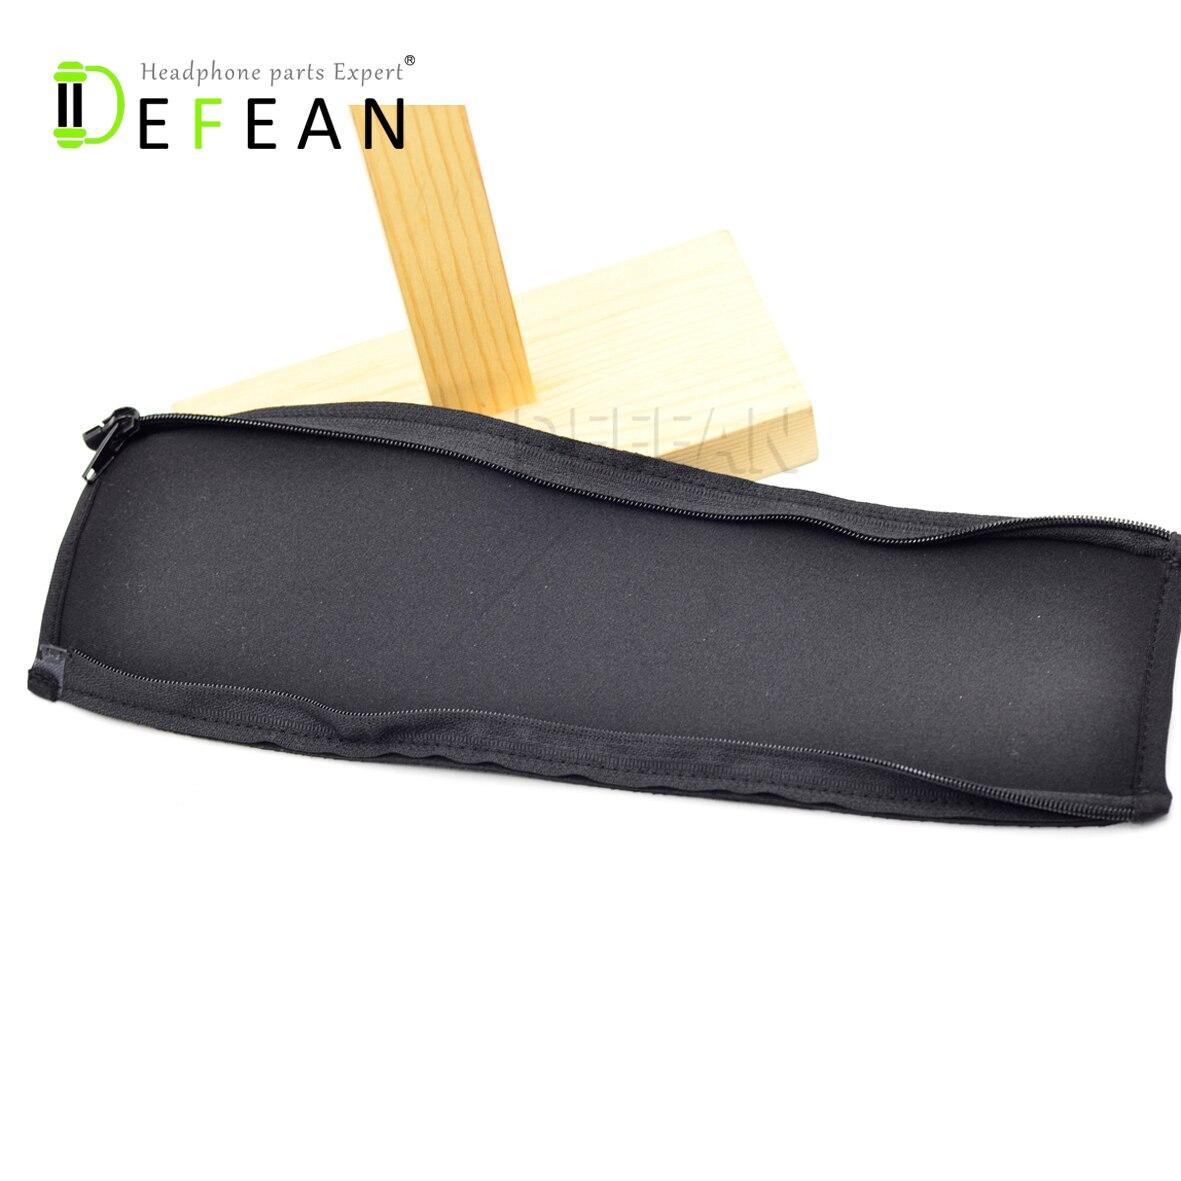 Defean Headphone Protector Headband Fabric For Audio